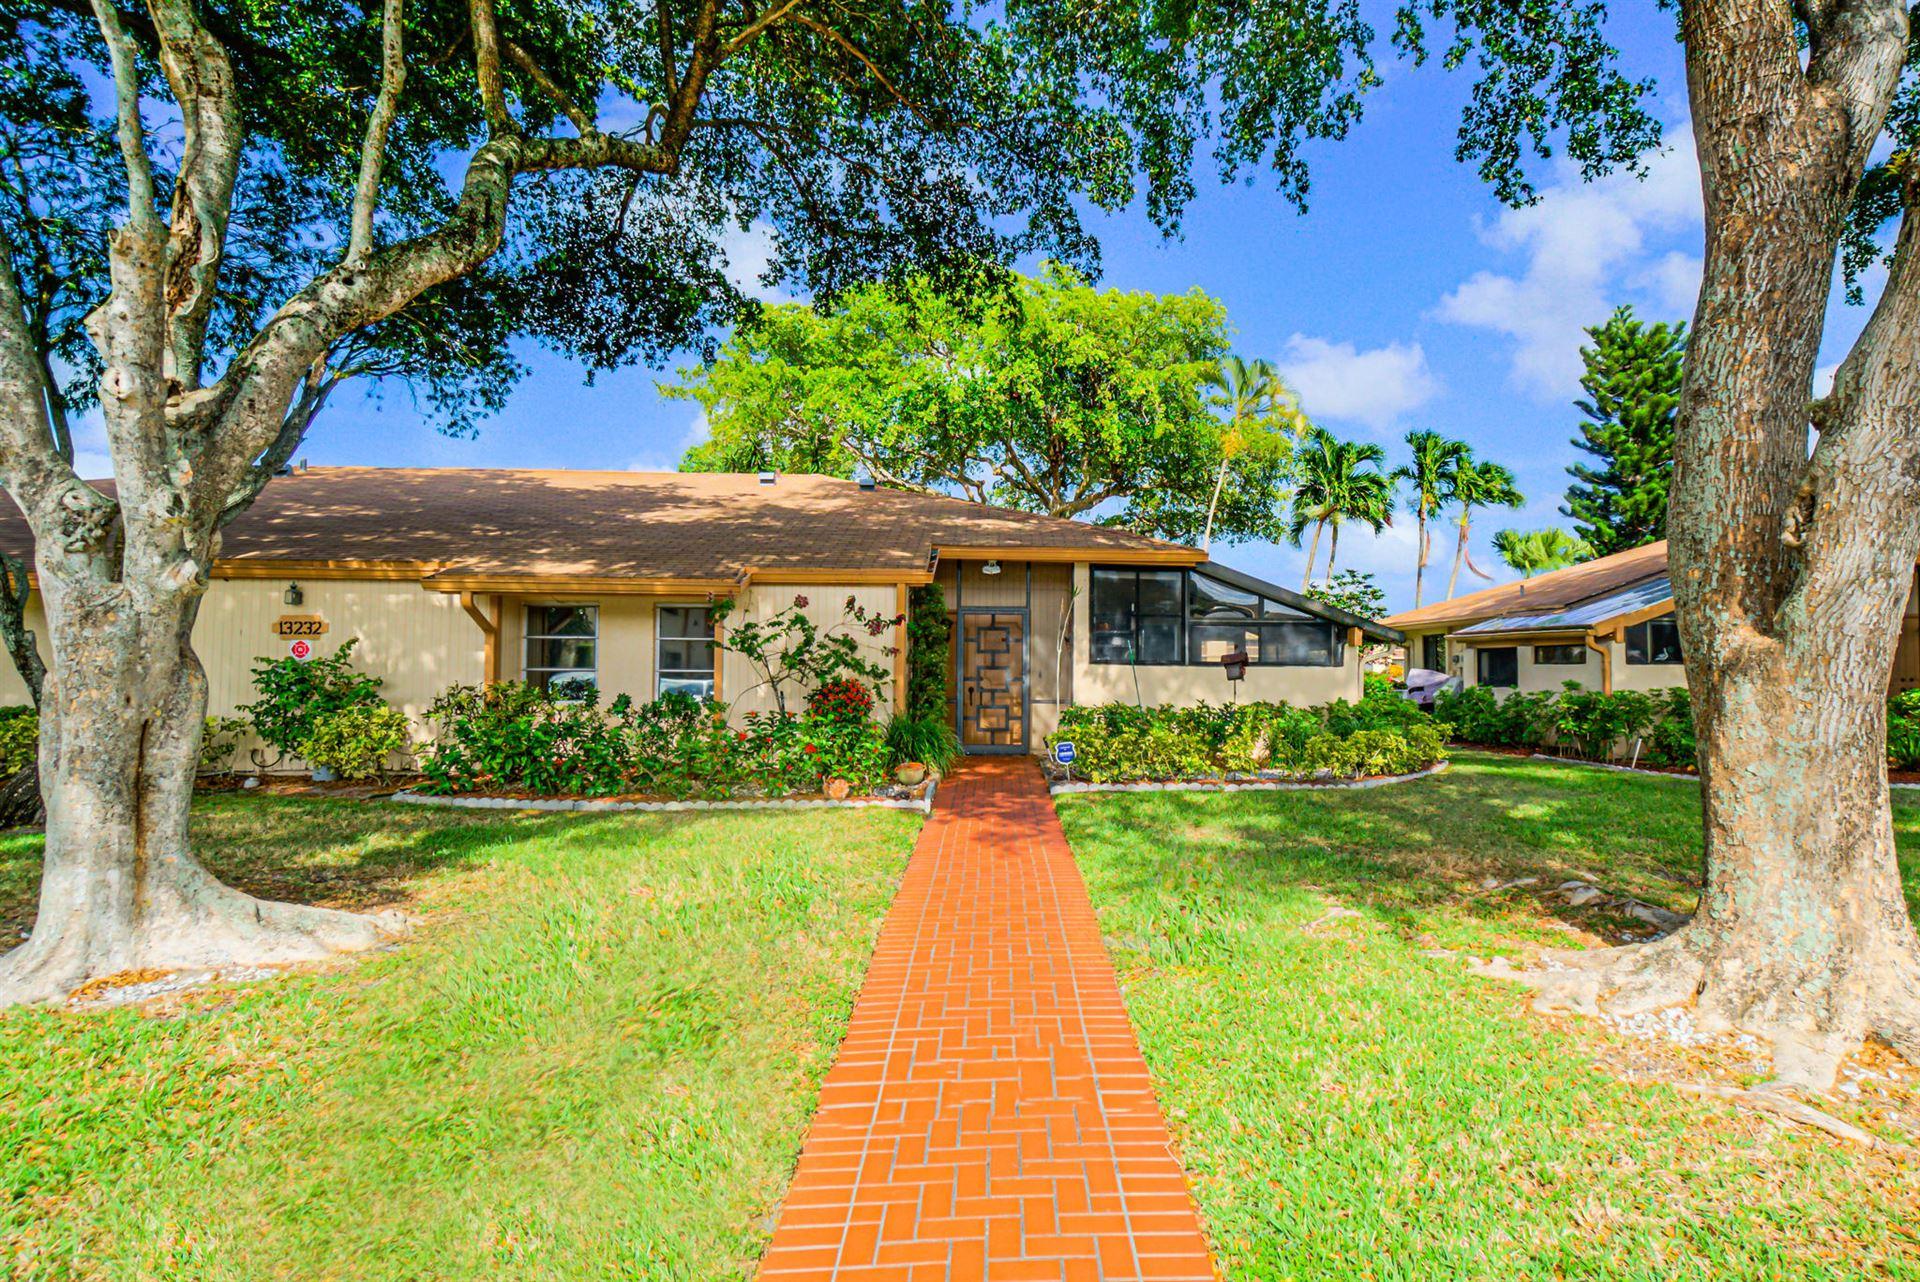 13232 Lucinda Palm Court #B, Delray Beach, FL 33484 - MLS#: RX-10718778